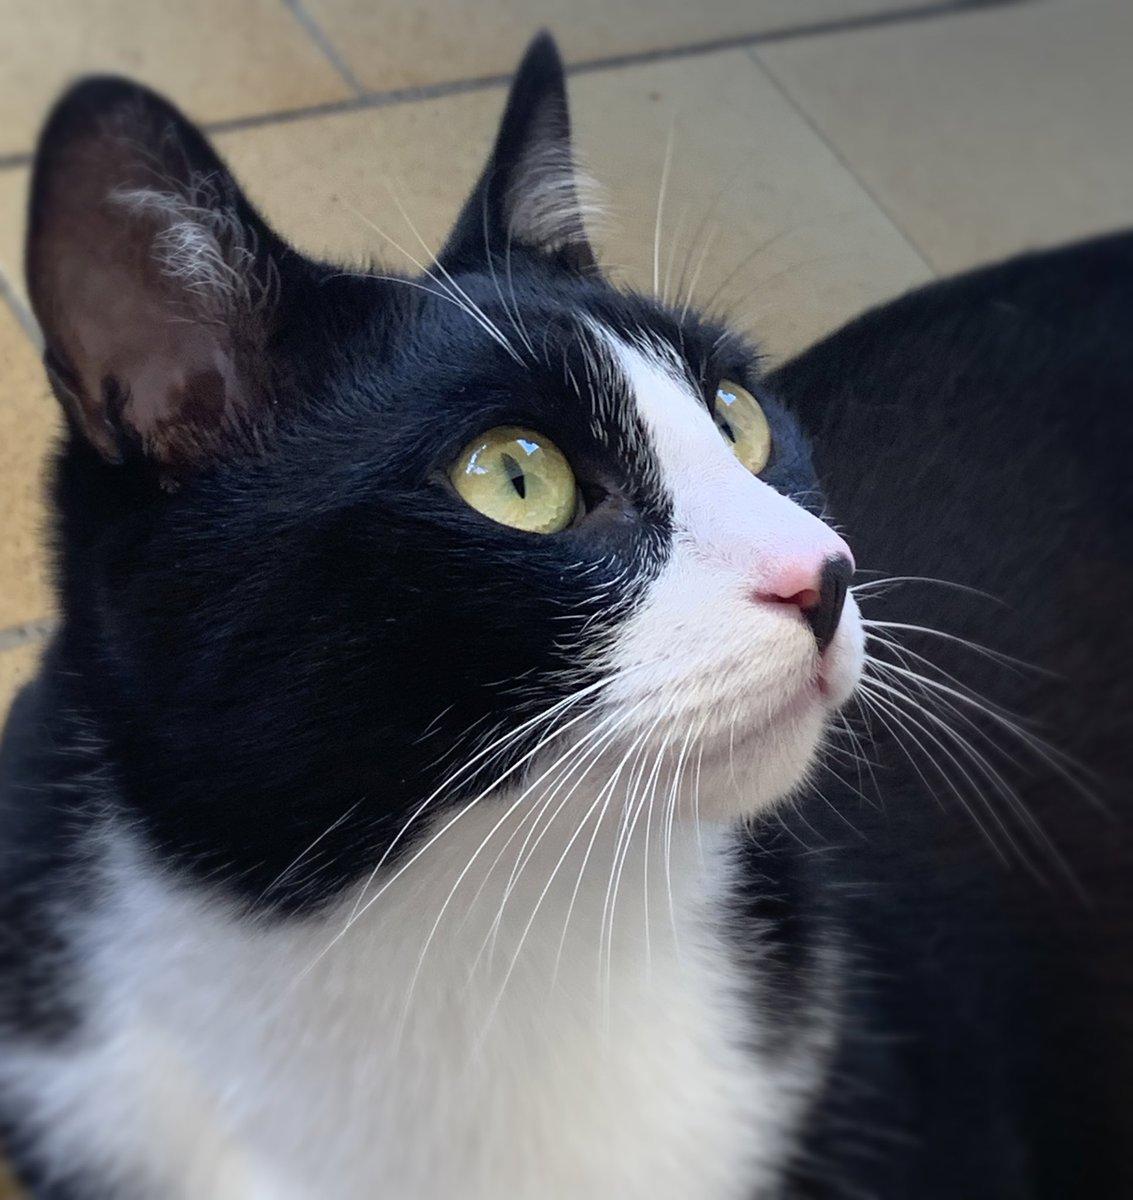 ARTÙ careful watcher | #cats #creativity #pets #meow #pets #kittens #kitten #catlife #catoftheday #kitty #cute #world #love #pet #dogs #animals #gatos #gato #lovecats #cutecats #love #life #follow #catlove #cutecat #petstagram #ilovemycat #animal #kittycatpic.twitter.com/xn2X79U7tc